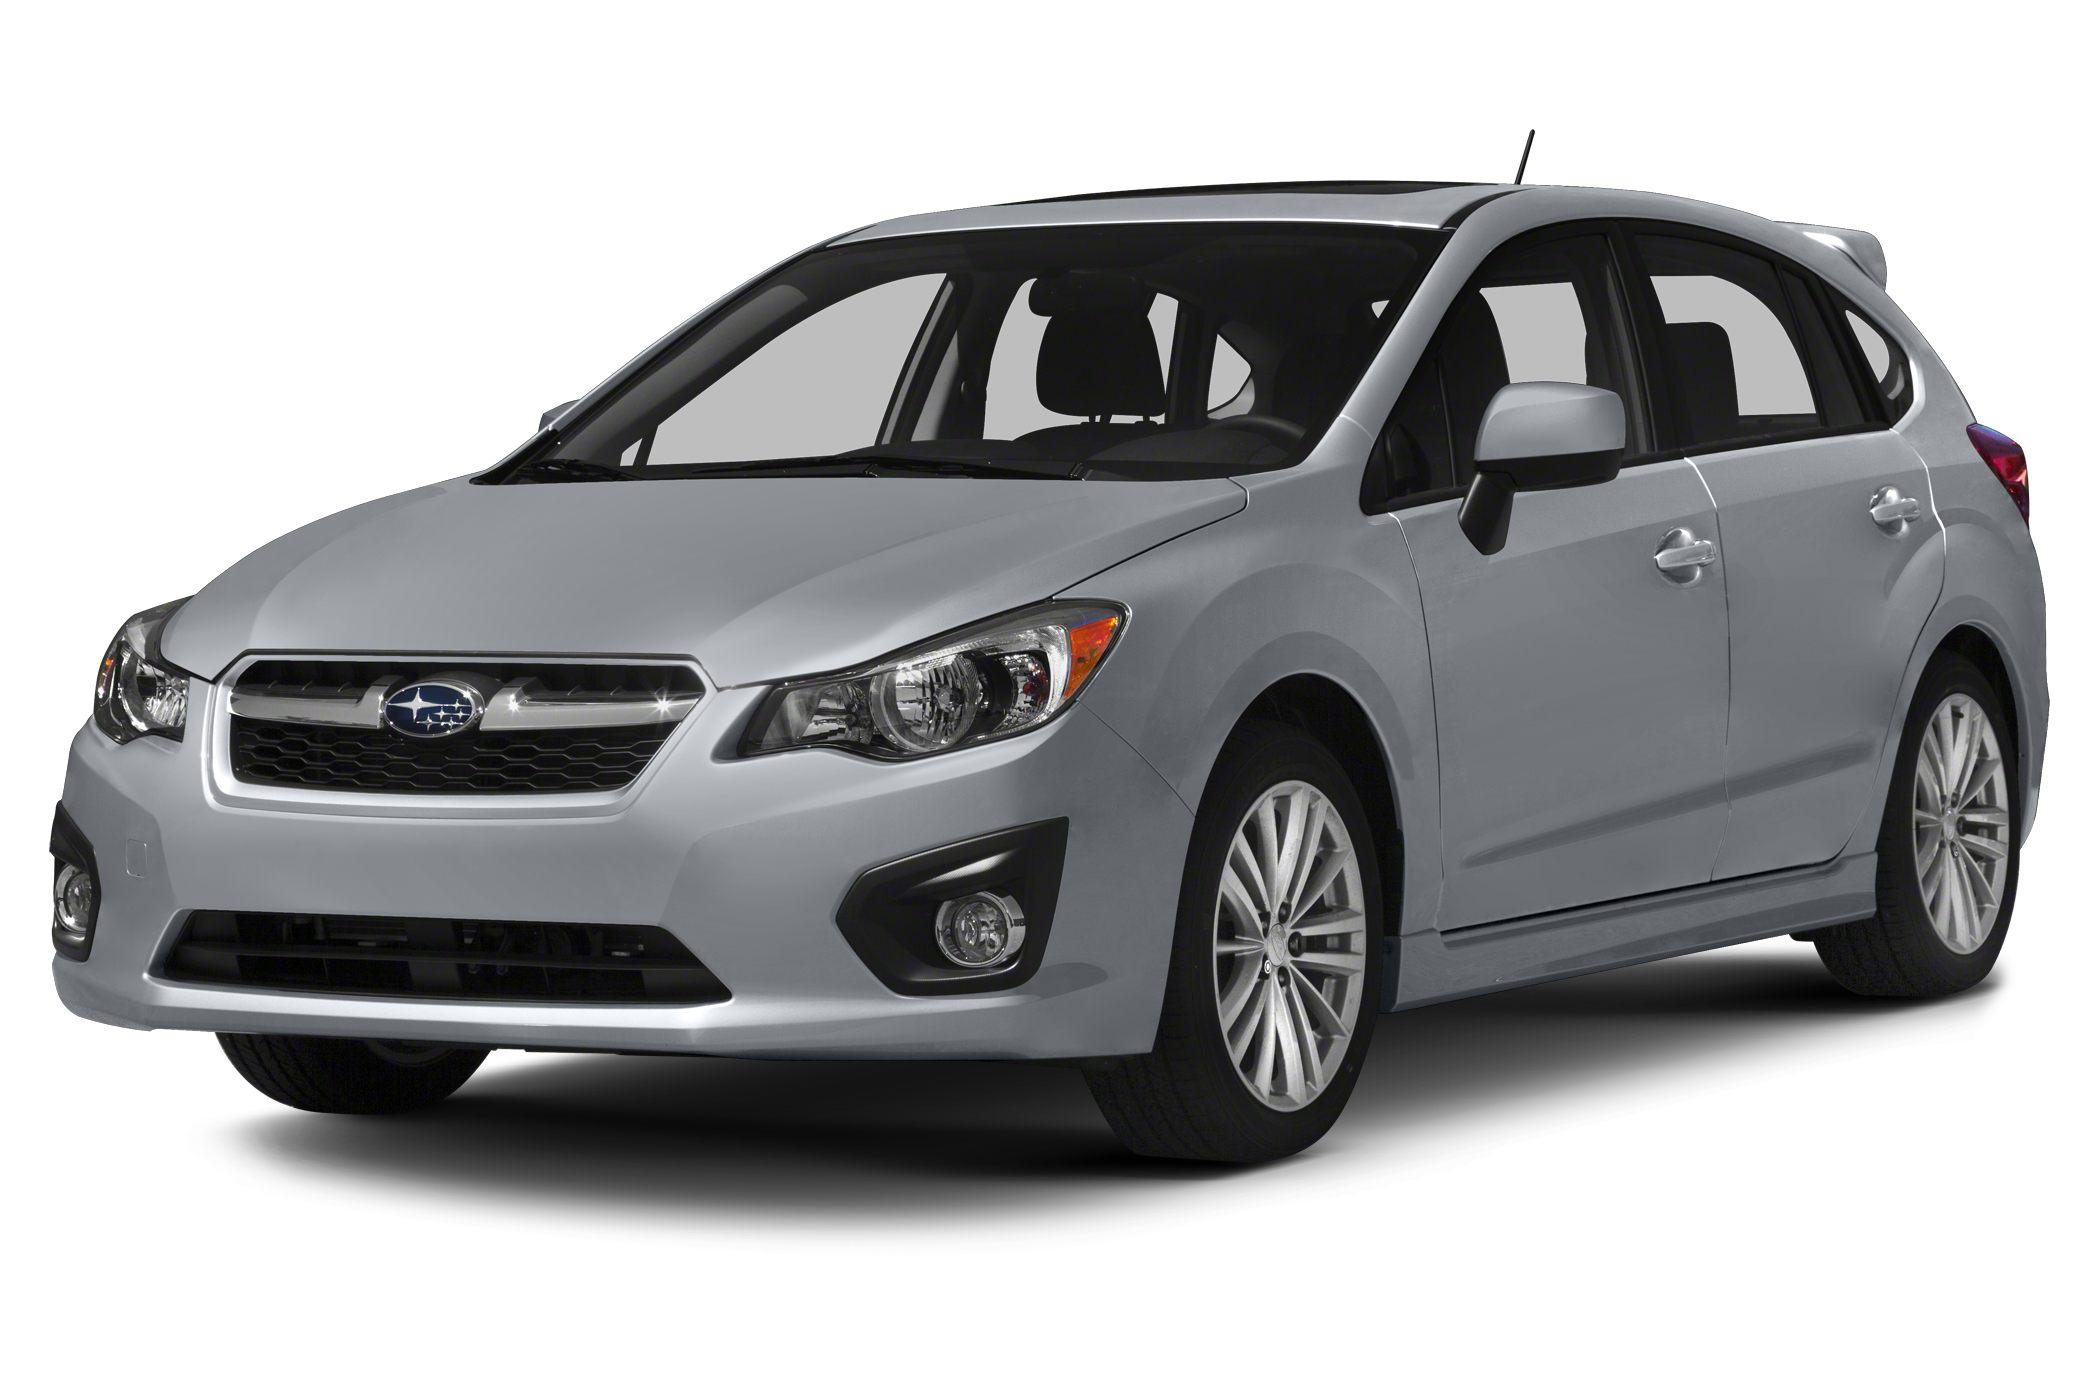 2014 Subaru Impreza 20i Premium Vehicle Options 4WDAWD Electronic Brake Assistance Second Row Fo